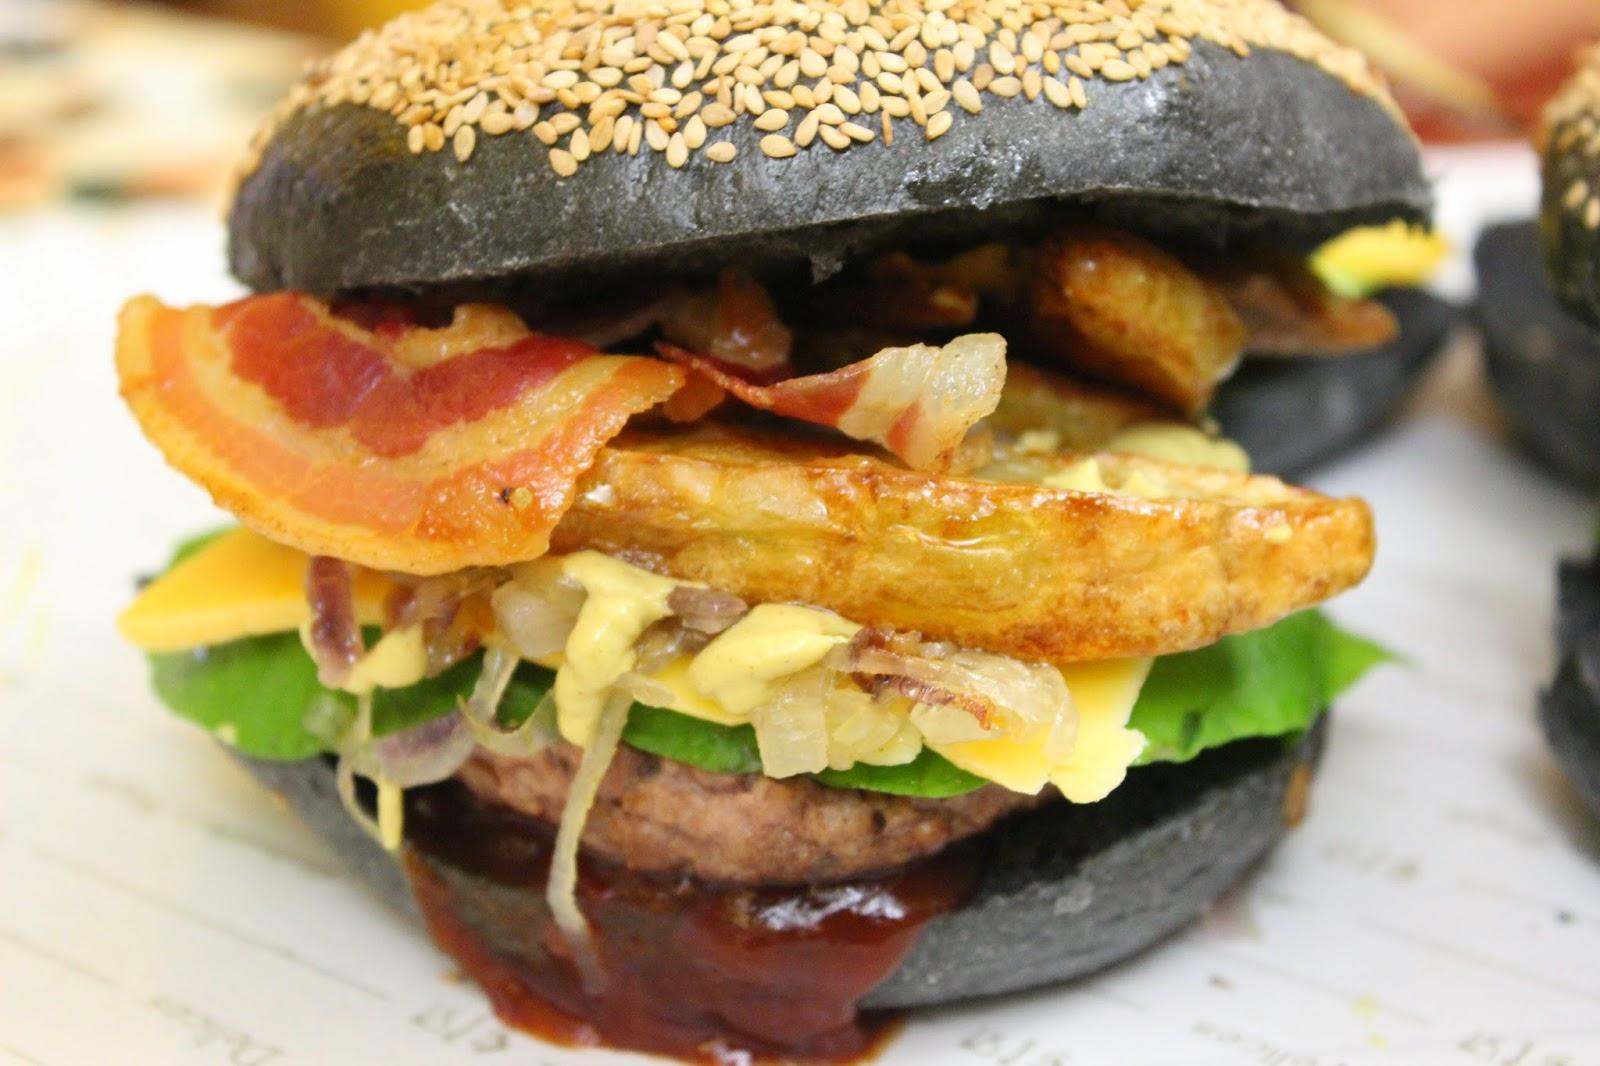 pane per hamburger con carbone vegetale